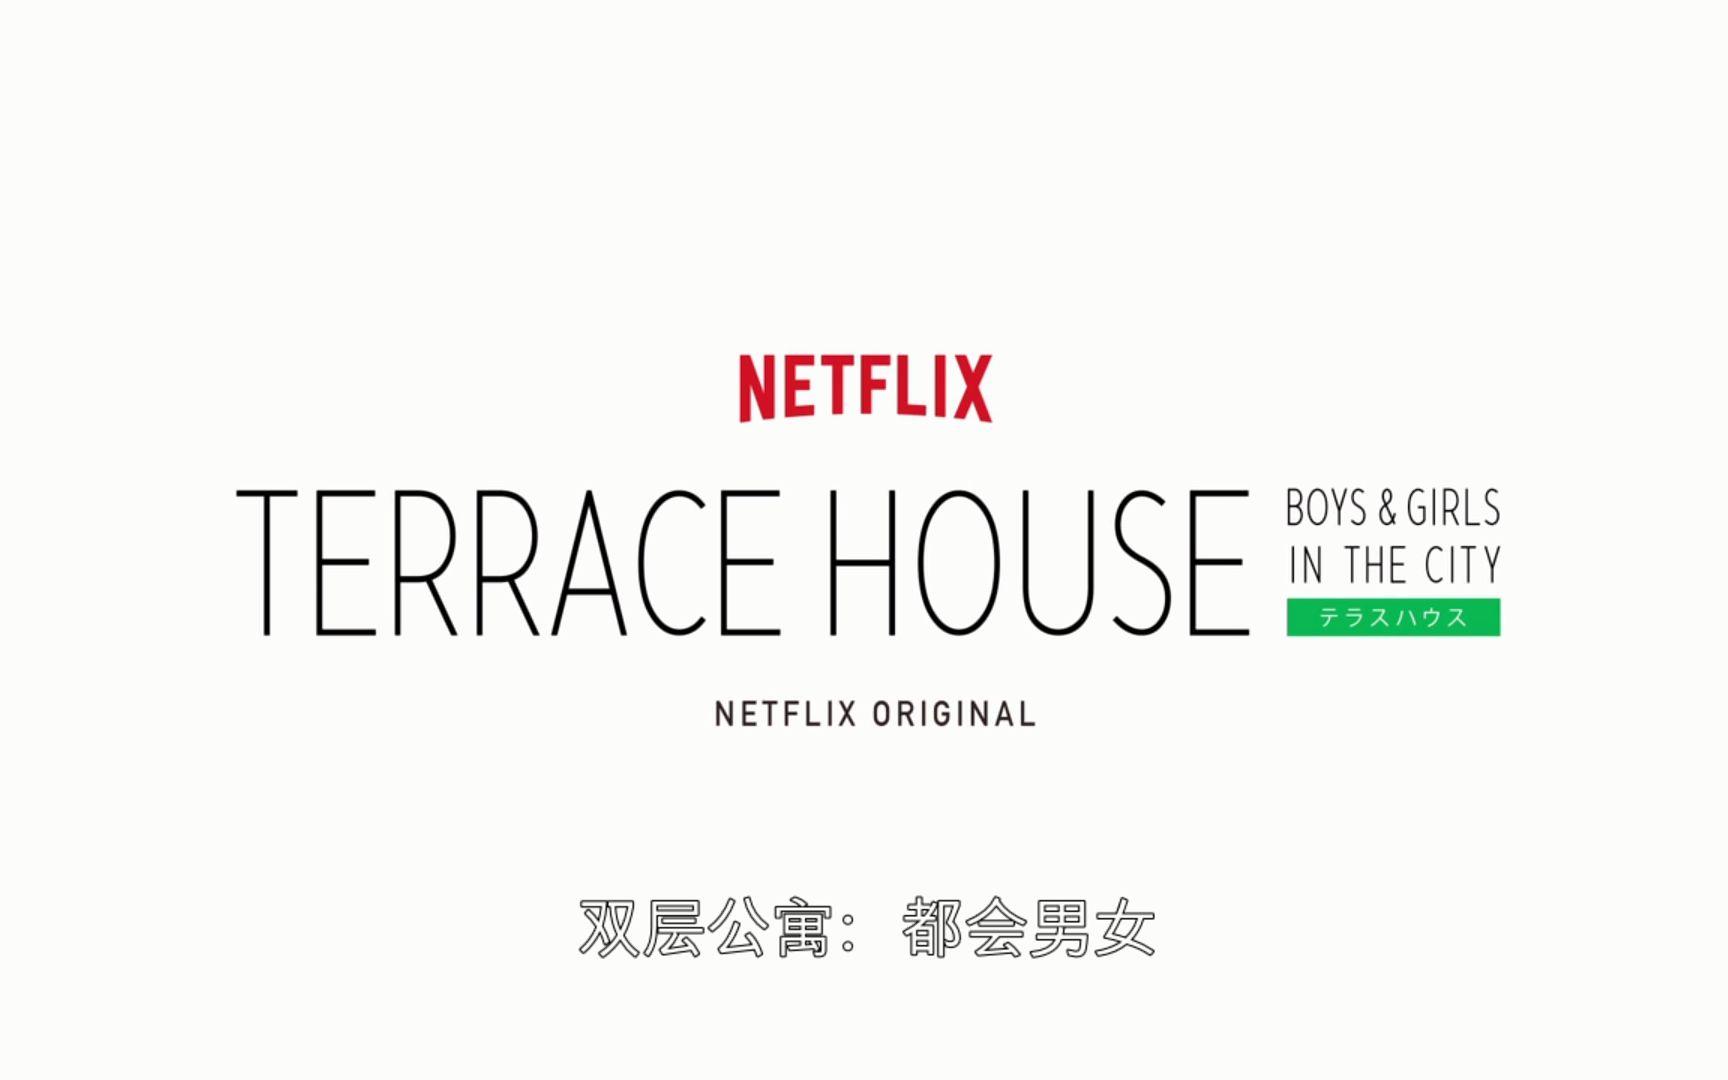 Terrace house bilibili for Netflix terrace house